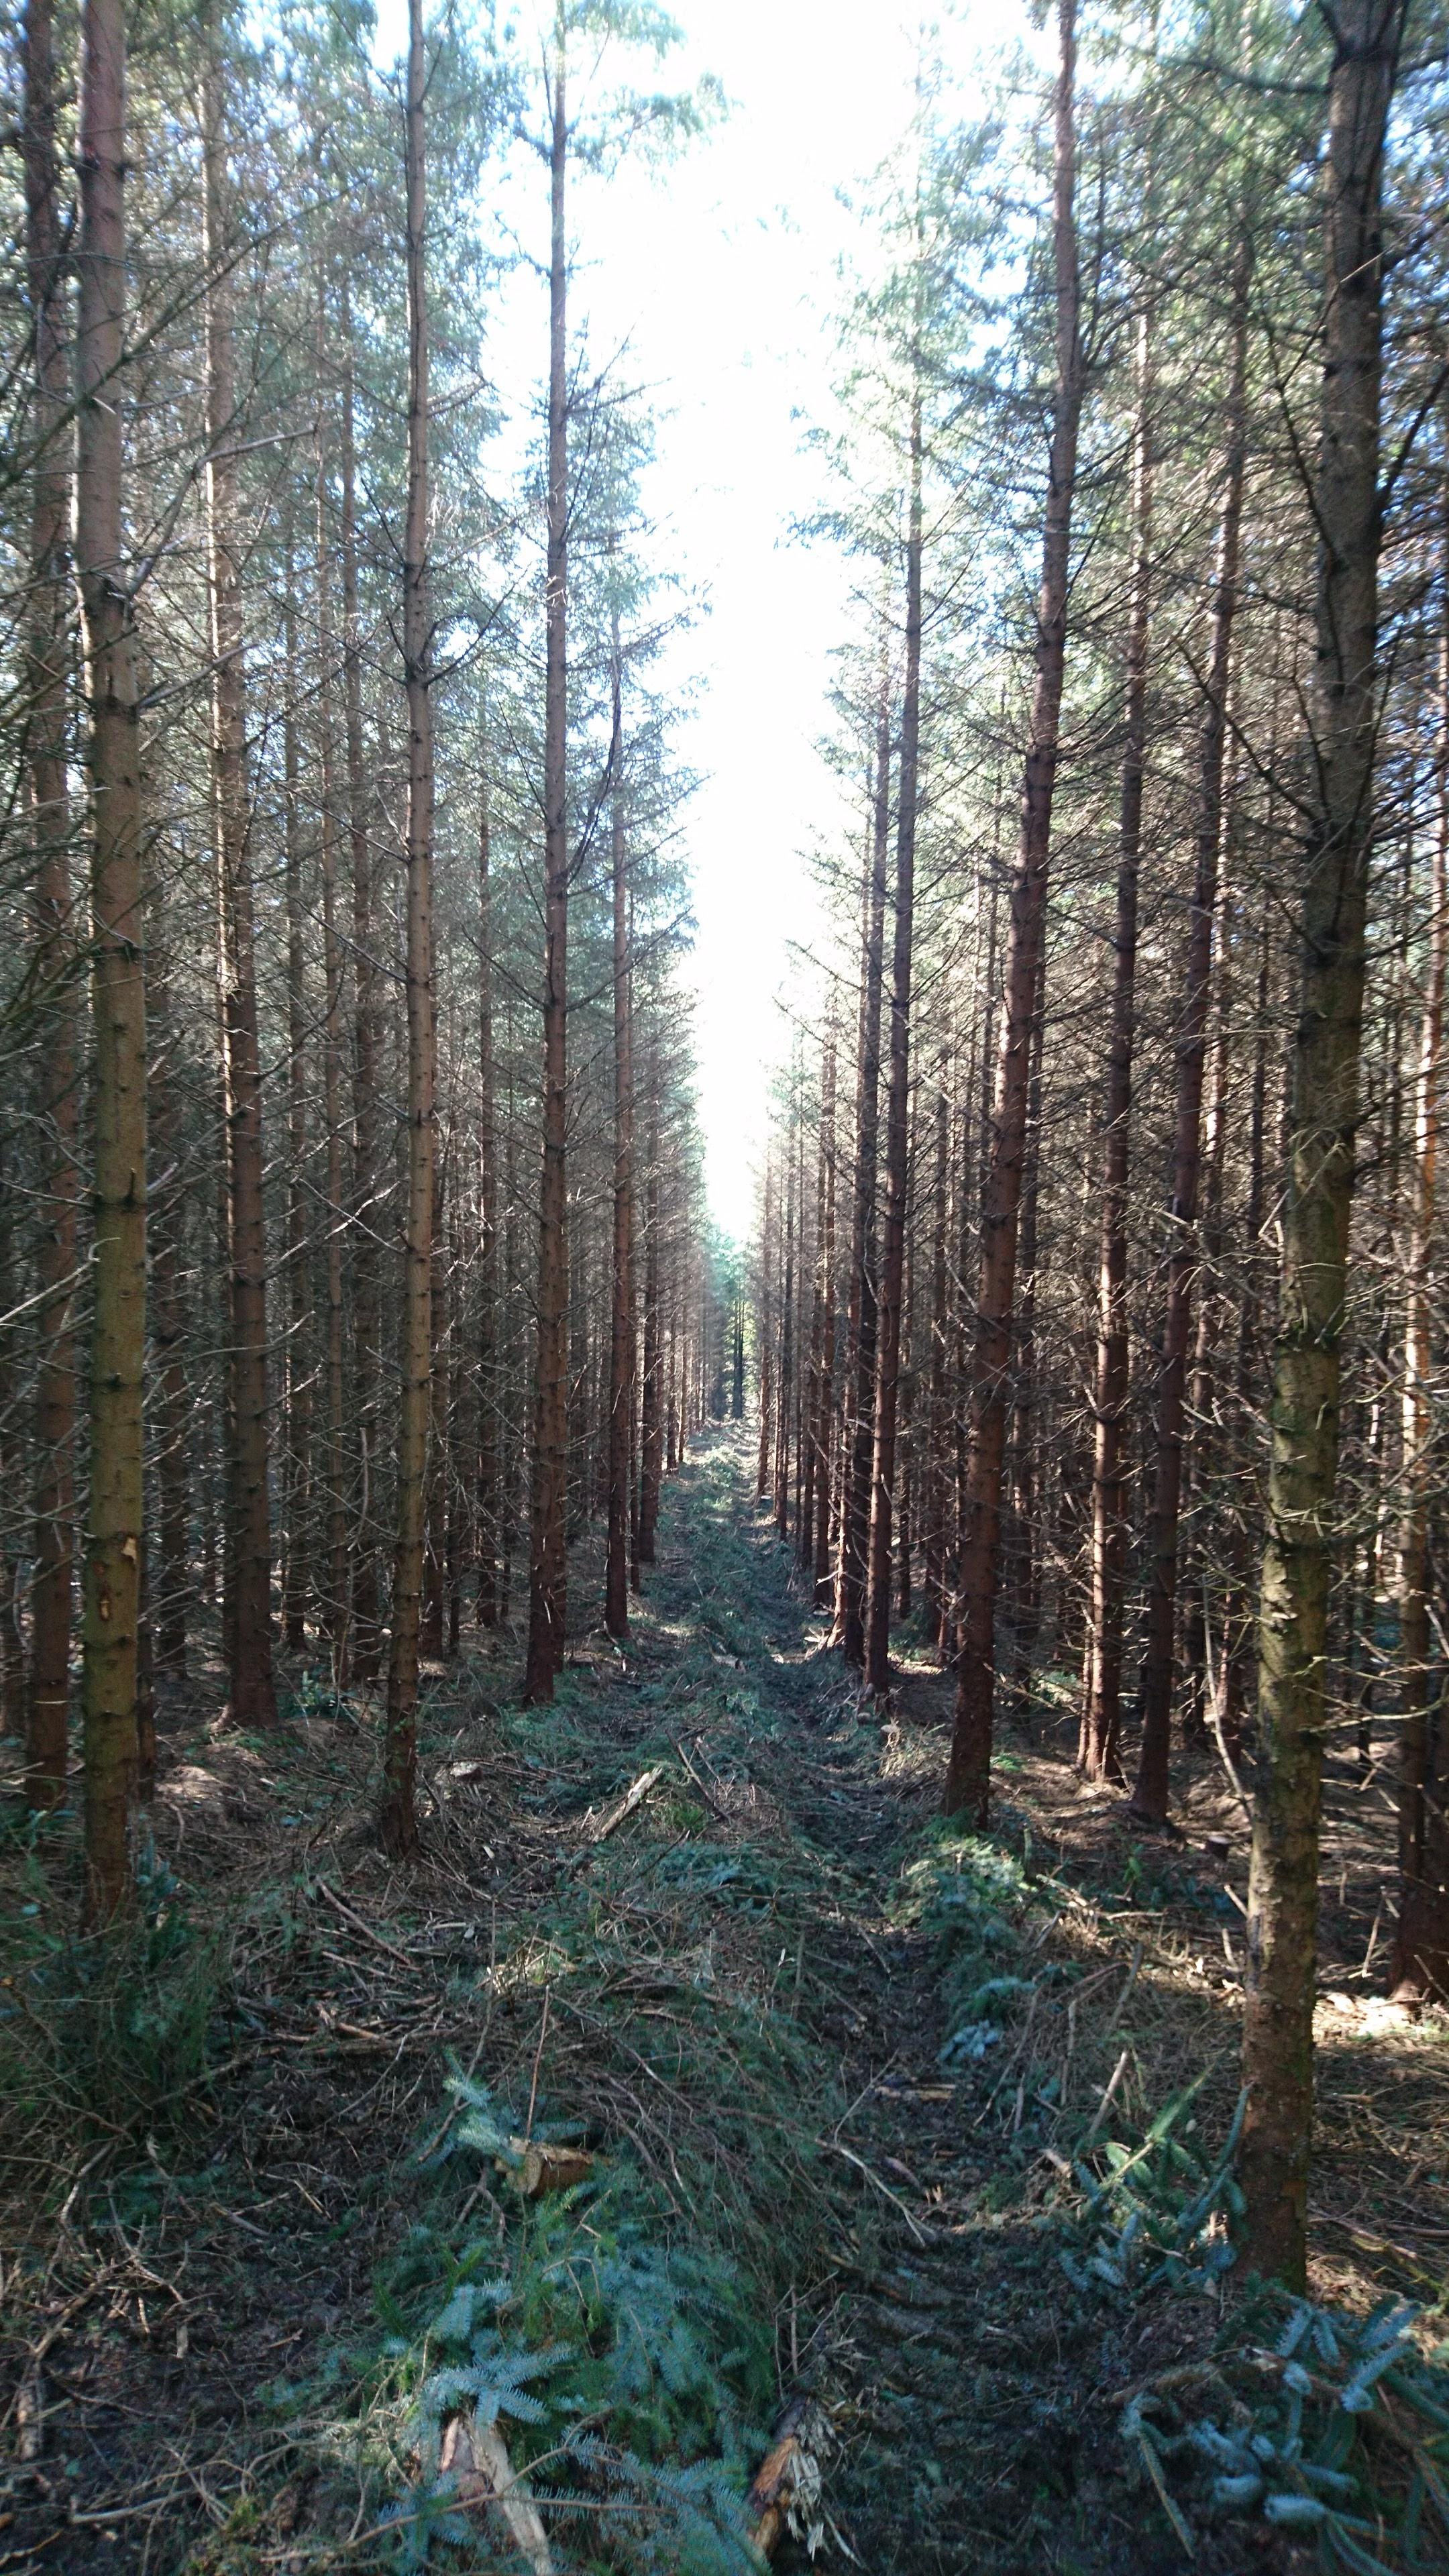 Timber felling